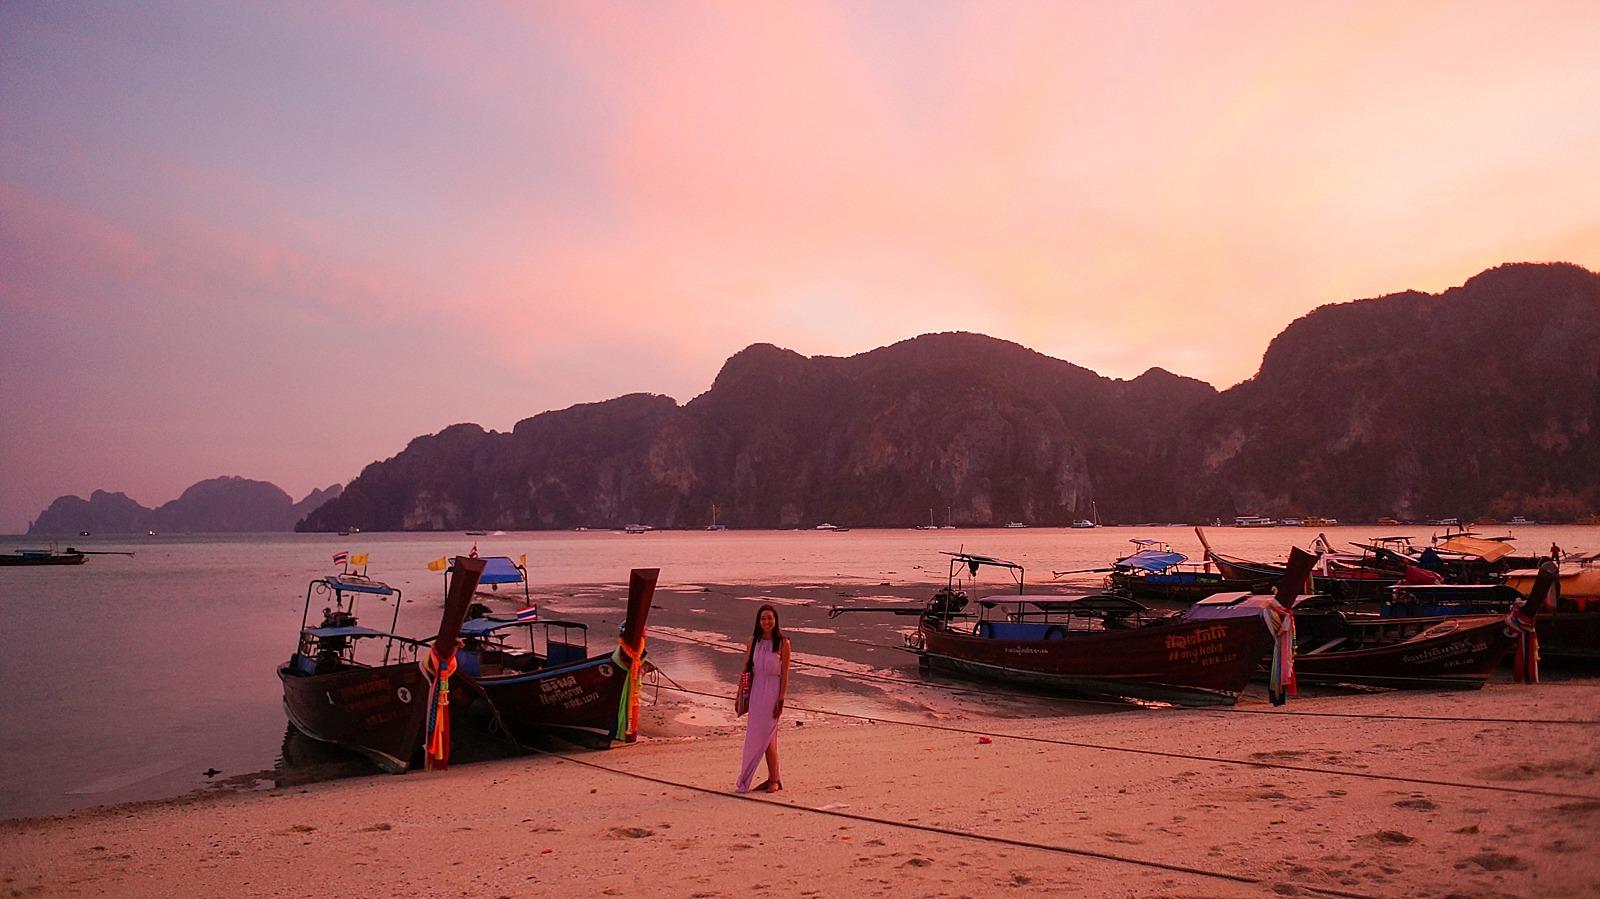 sunset image of Thailand phi phi islands orange sky